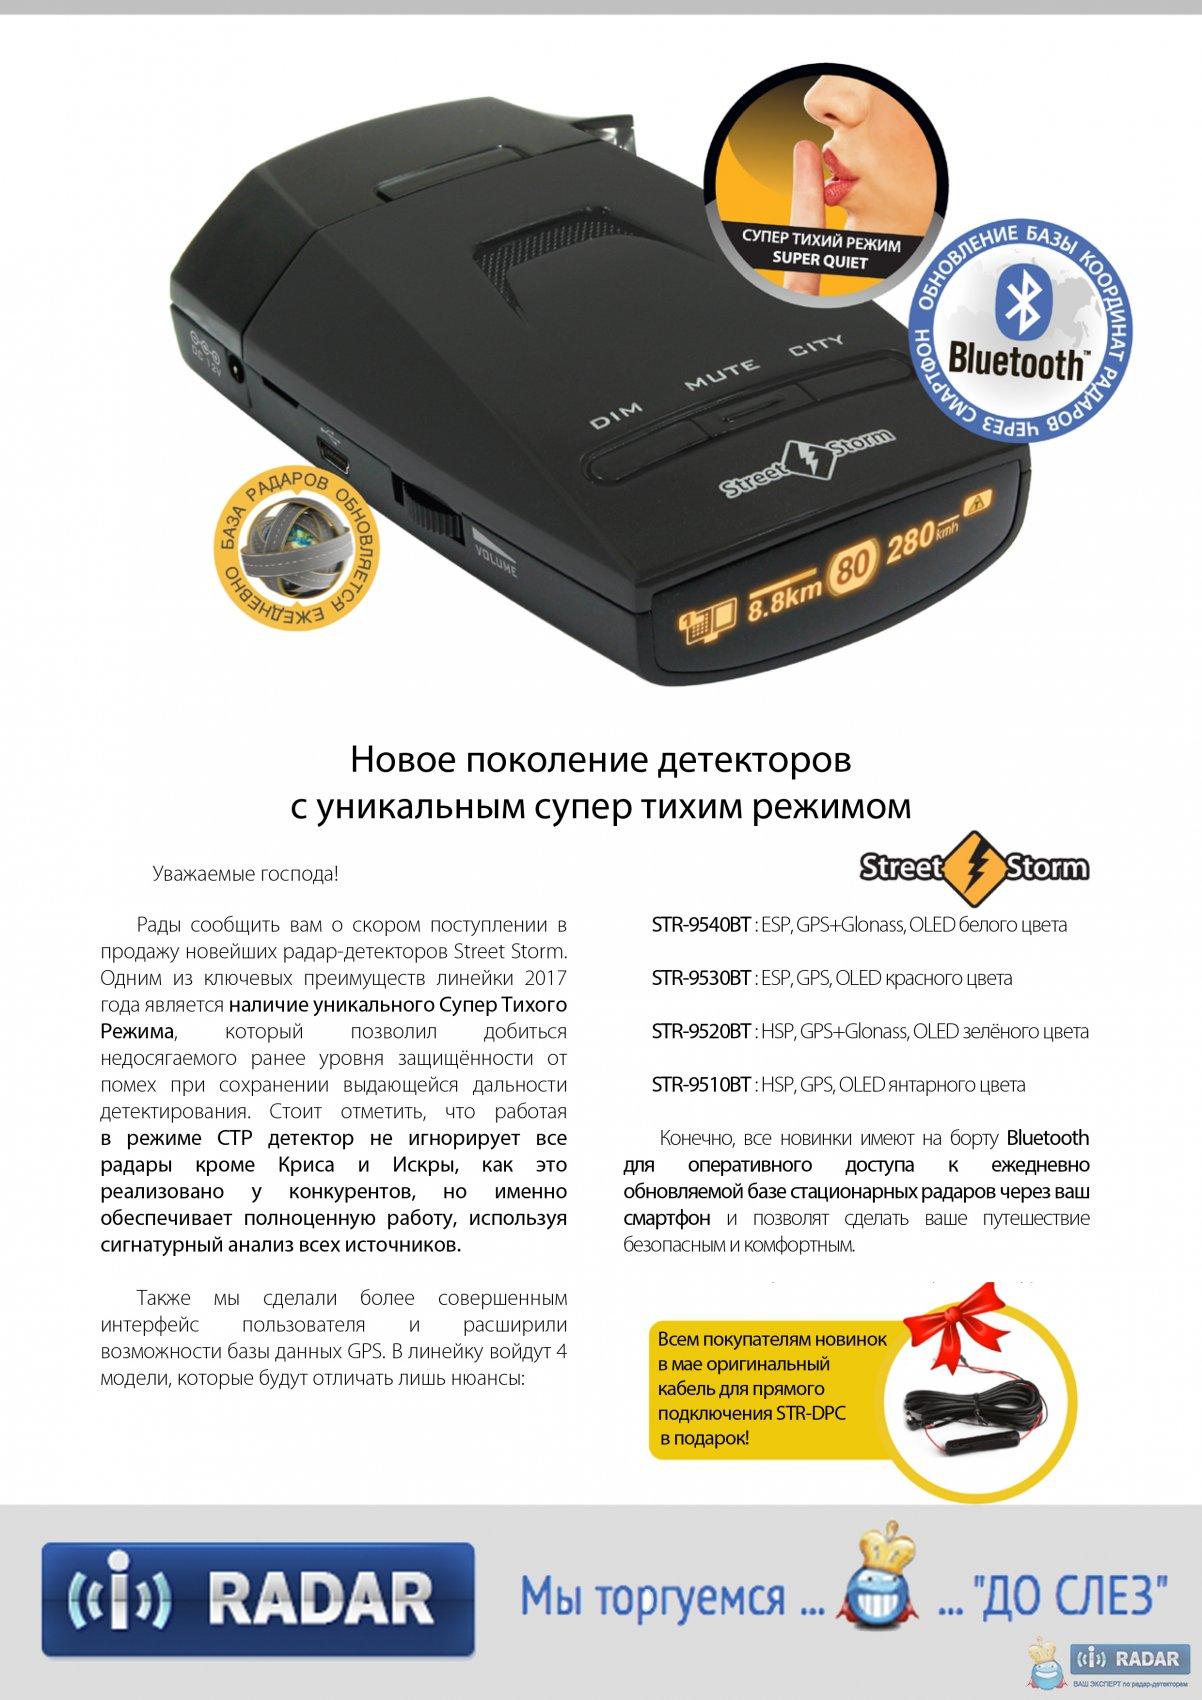 Радар-детектор PlayMe Hard 2